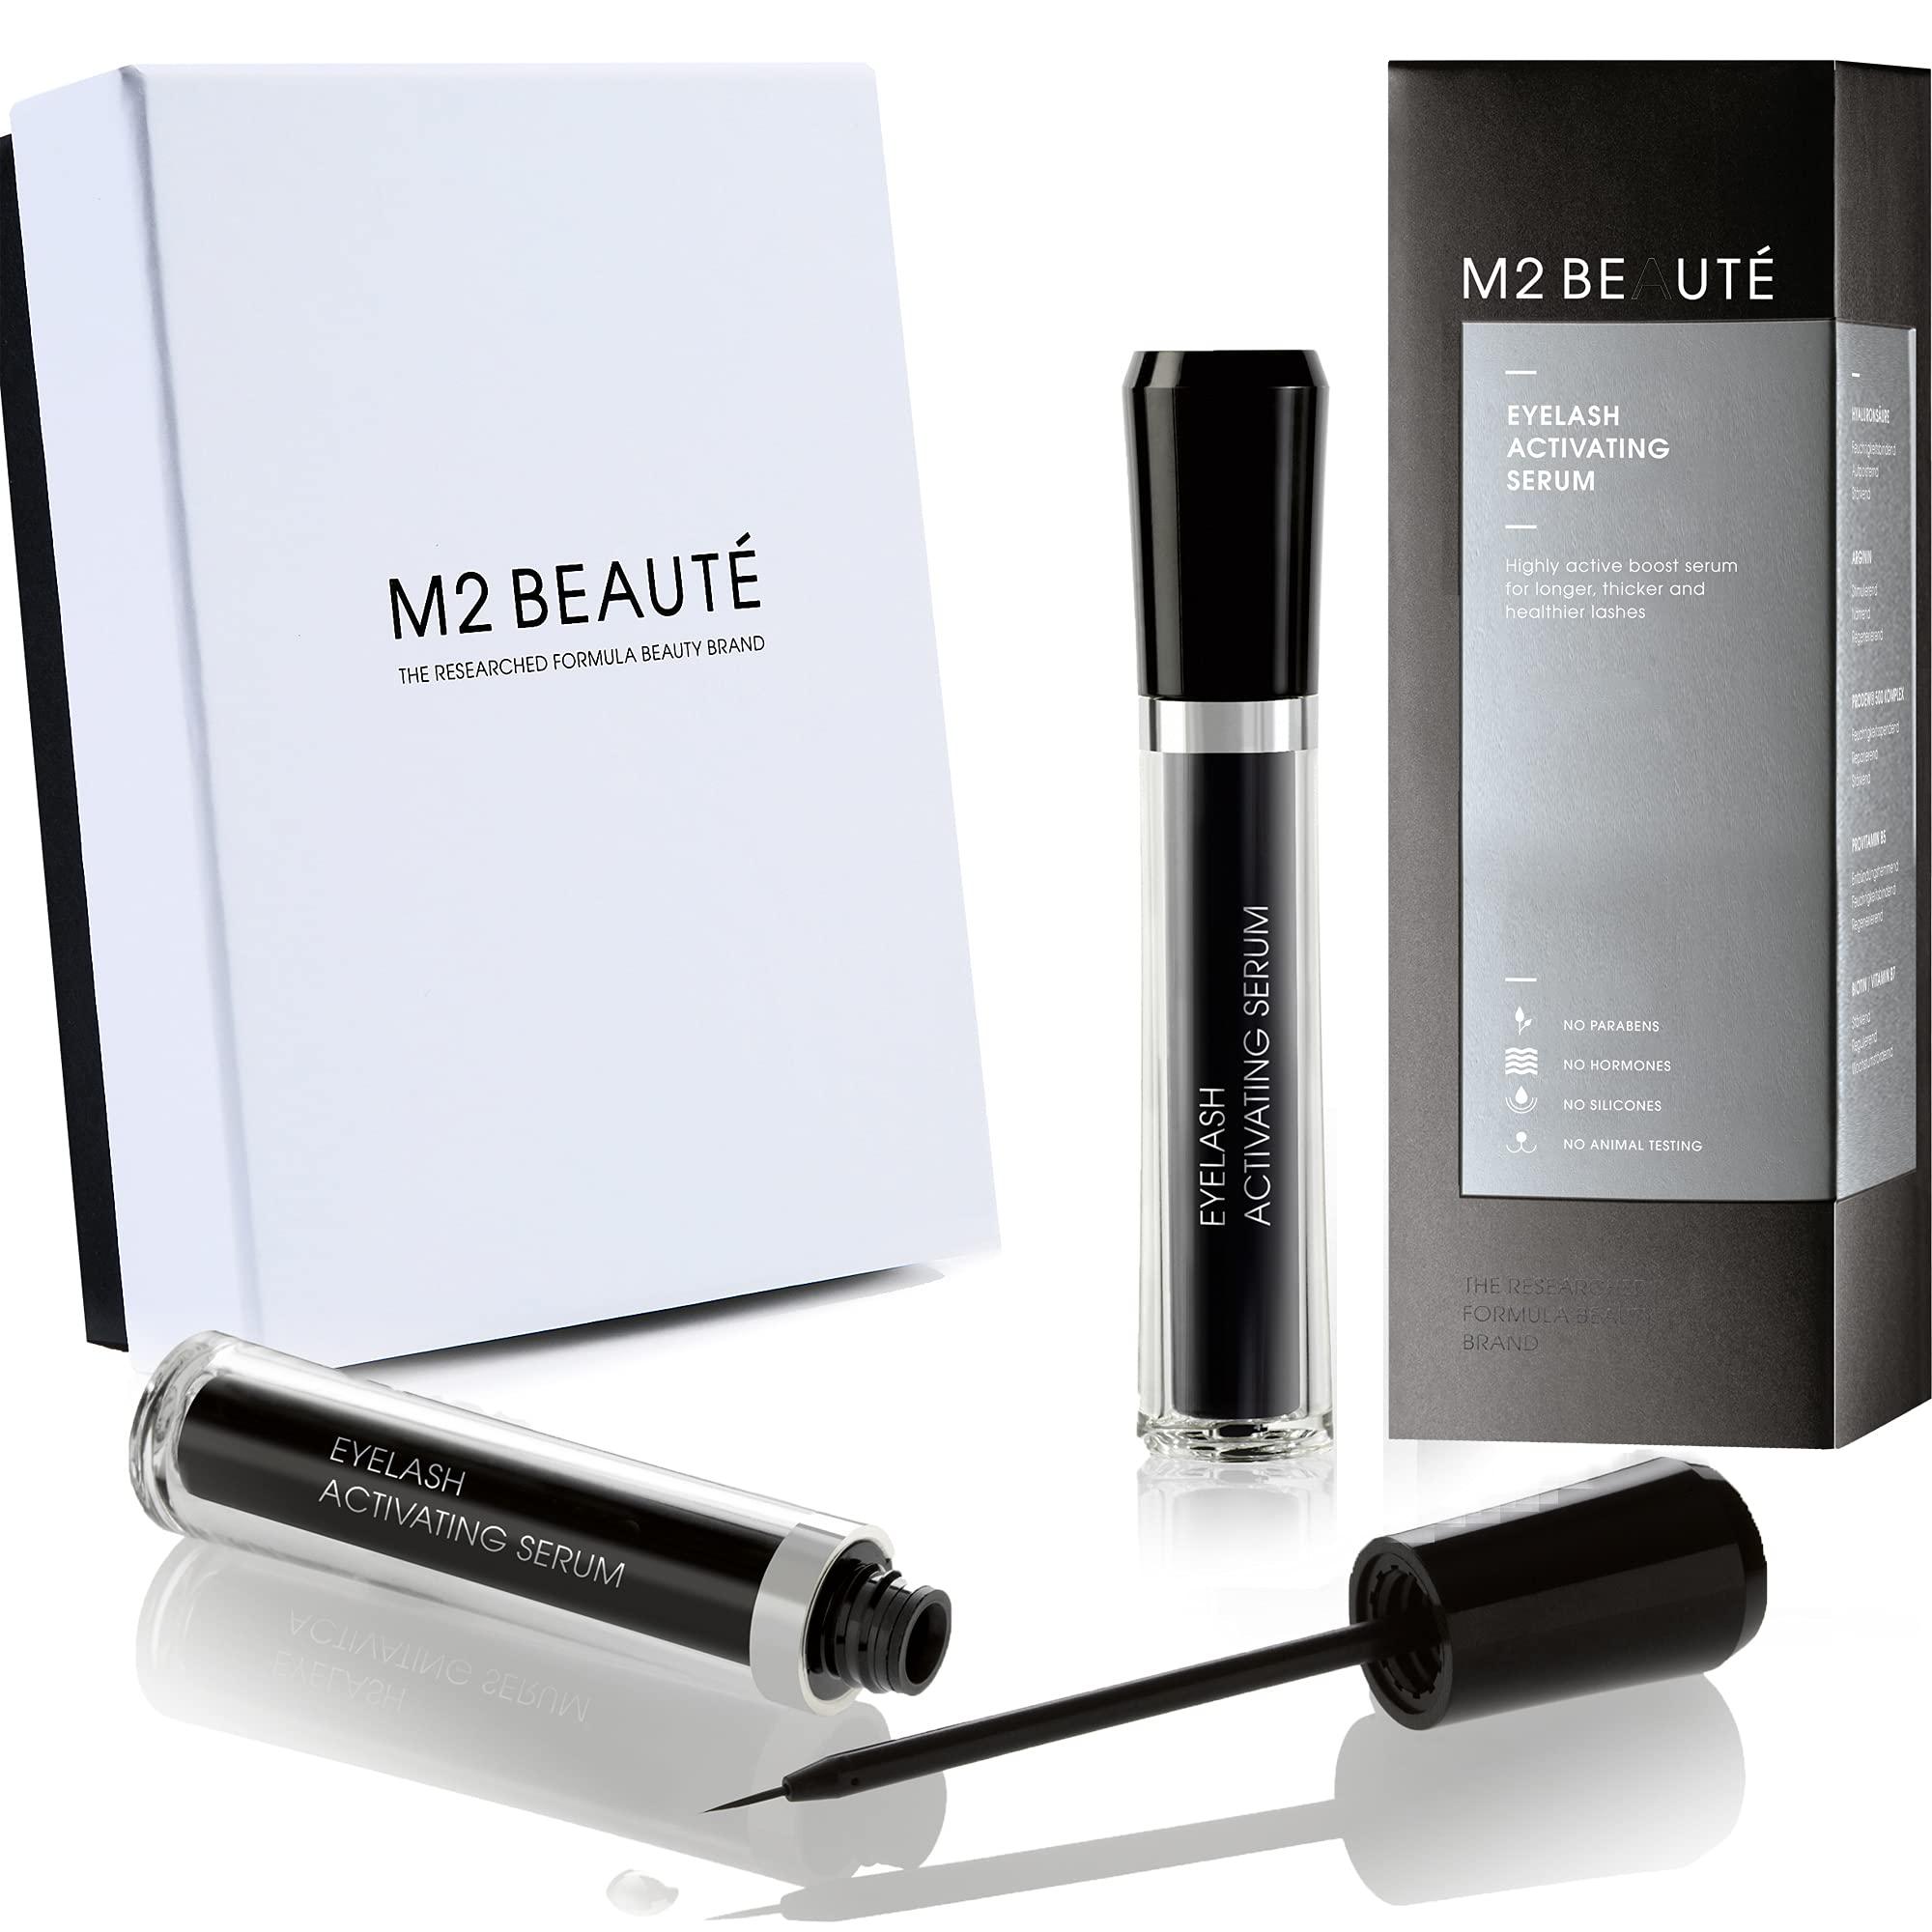 M2 BEAUTE Eyelash Activating Serum & M2Beaute Gift Box | Dermatologist Tested Product ,Highest German Quality Professional Eyelash Serum for Growing Natural Lashes